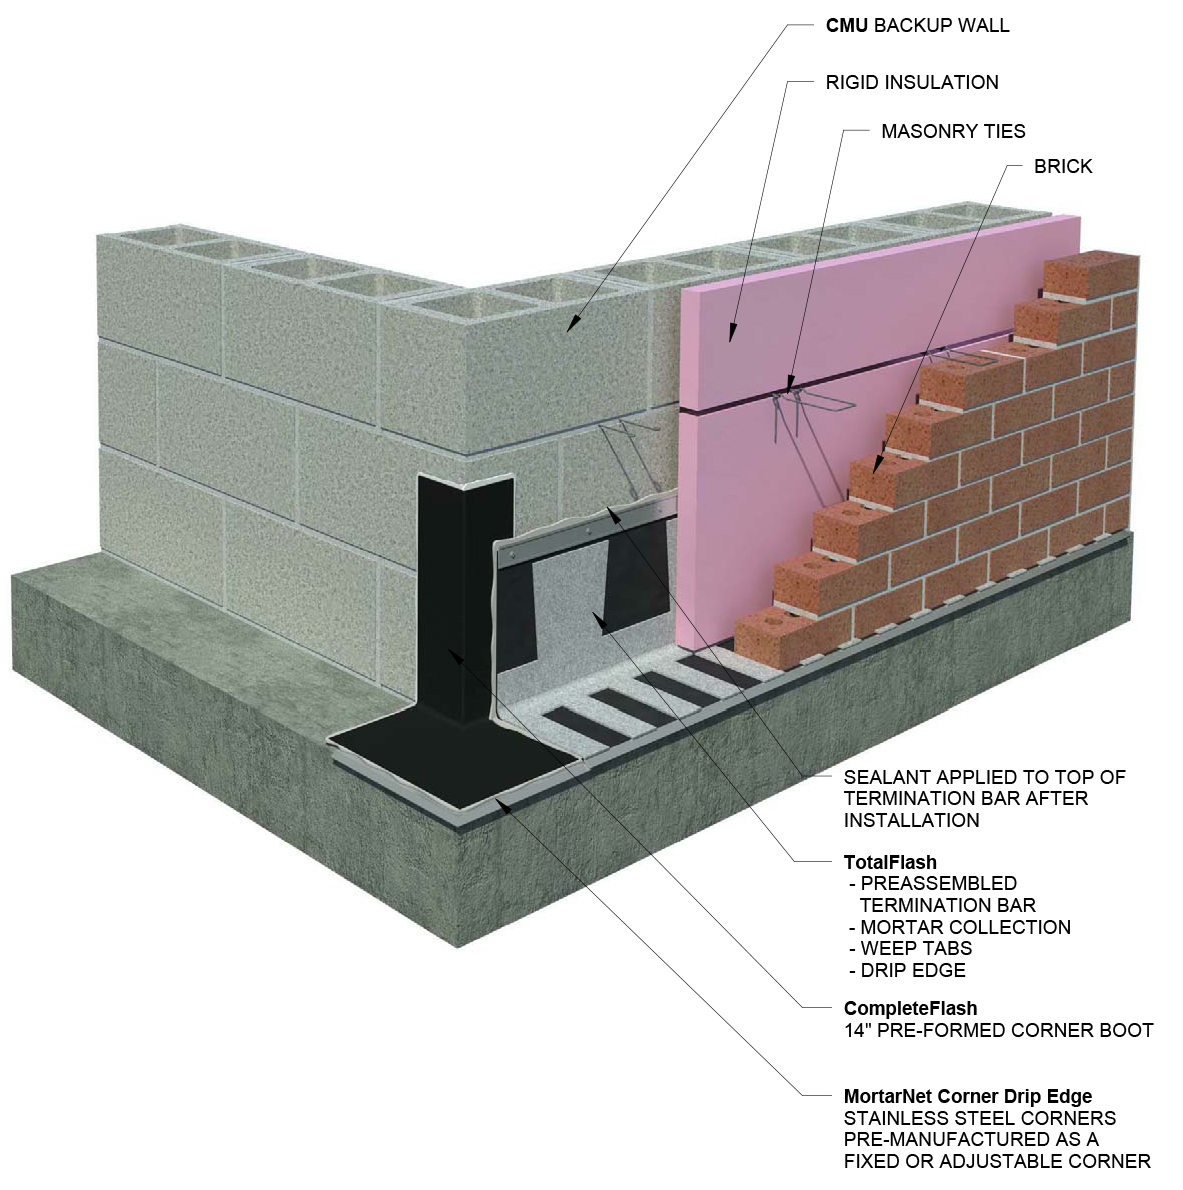 TotalFlash Wall Base - CMU